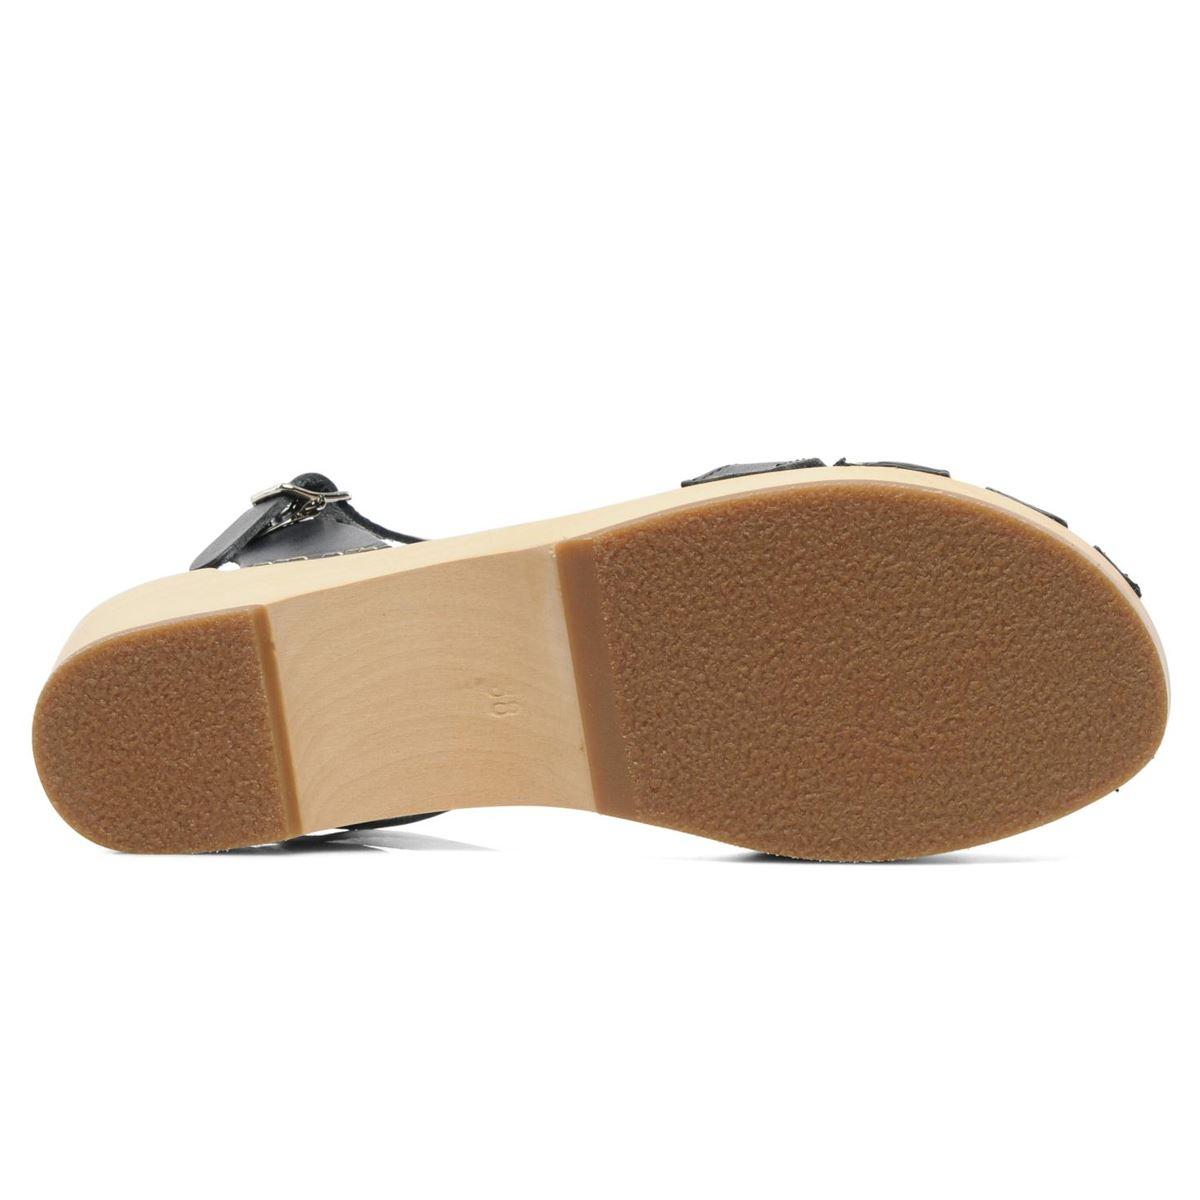 Womens sandals ebay - Hasbeens Debutant Black Womens Sandals